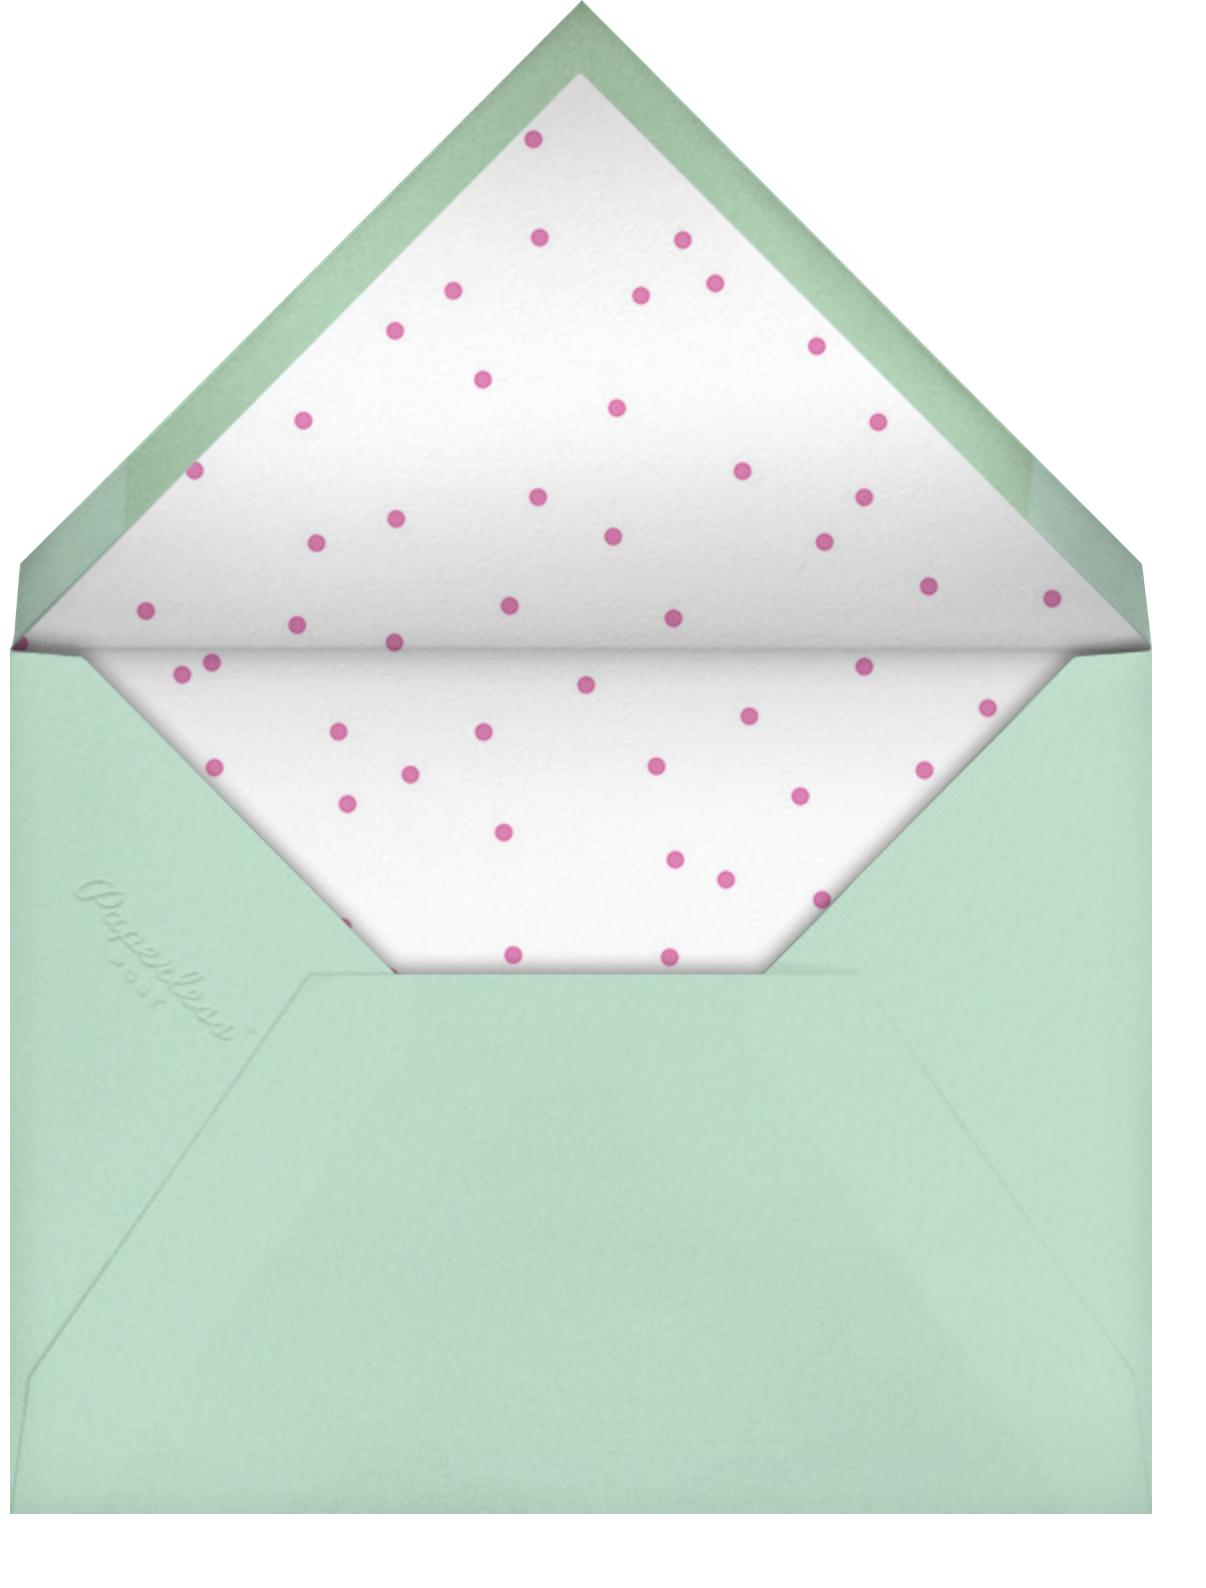 Sunny Party - Meri Meri - Kids' birthday - envelope back